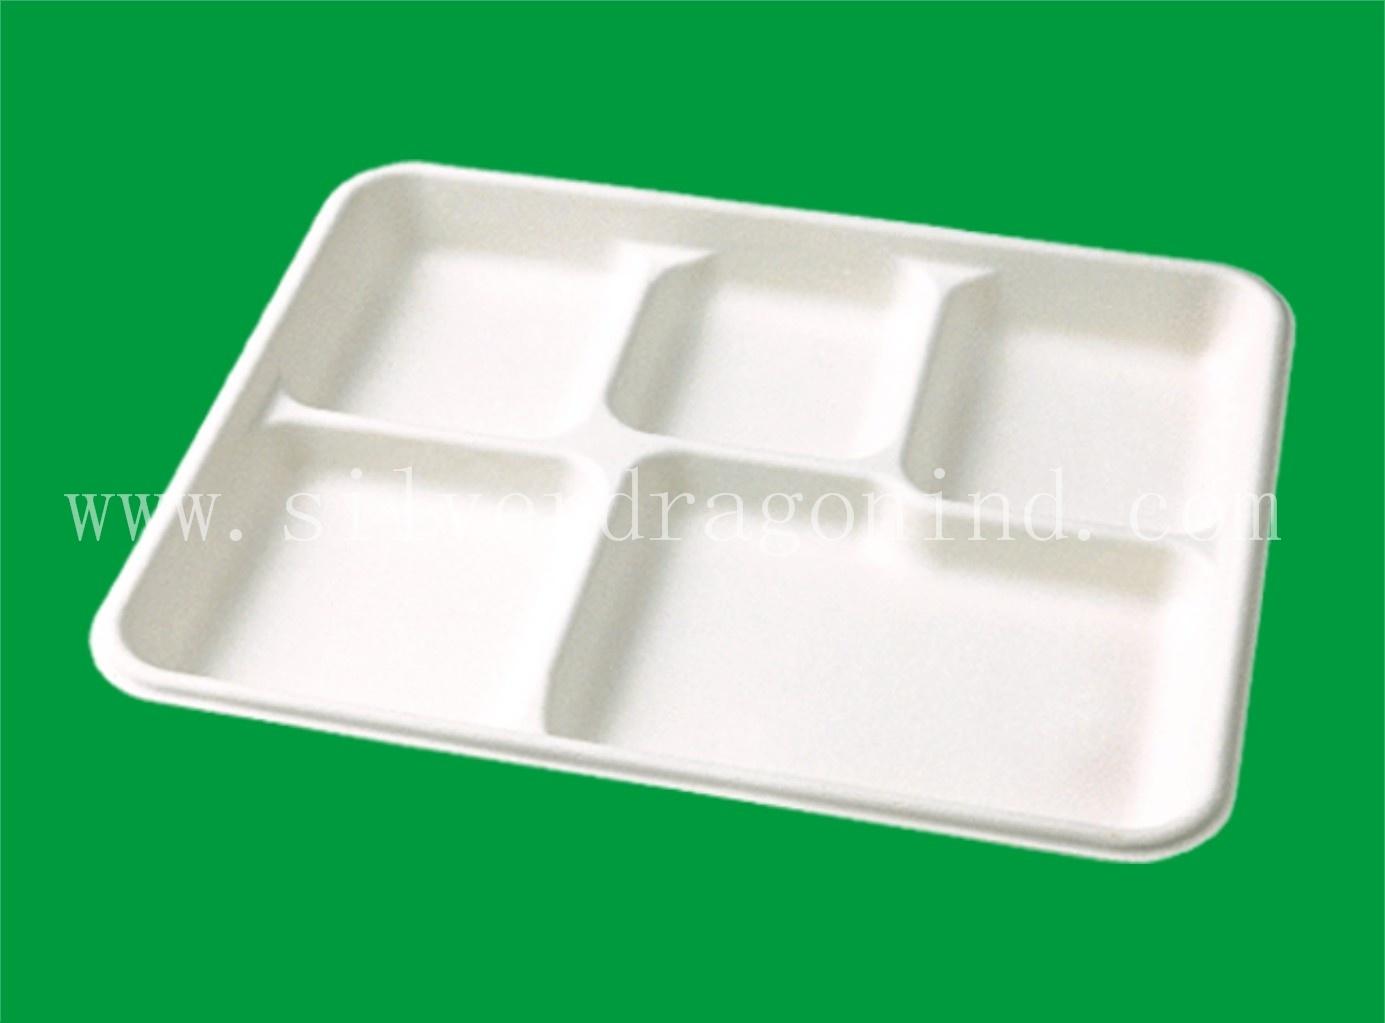 Biodegradable Disposable Compostable Sugarcane Bagasse Paper Plate